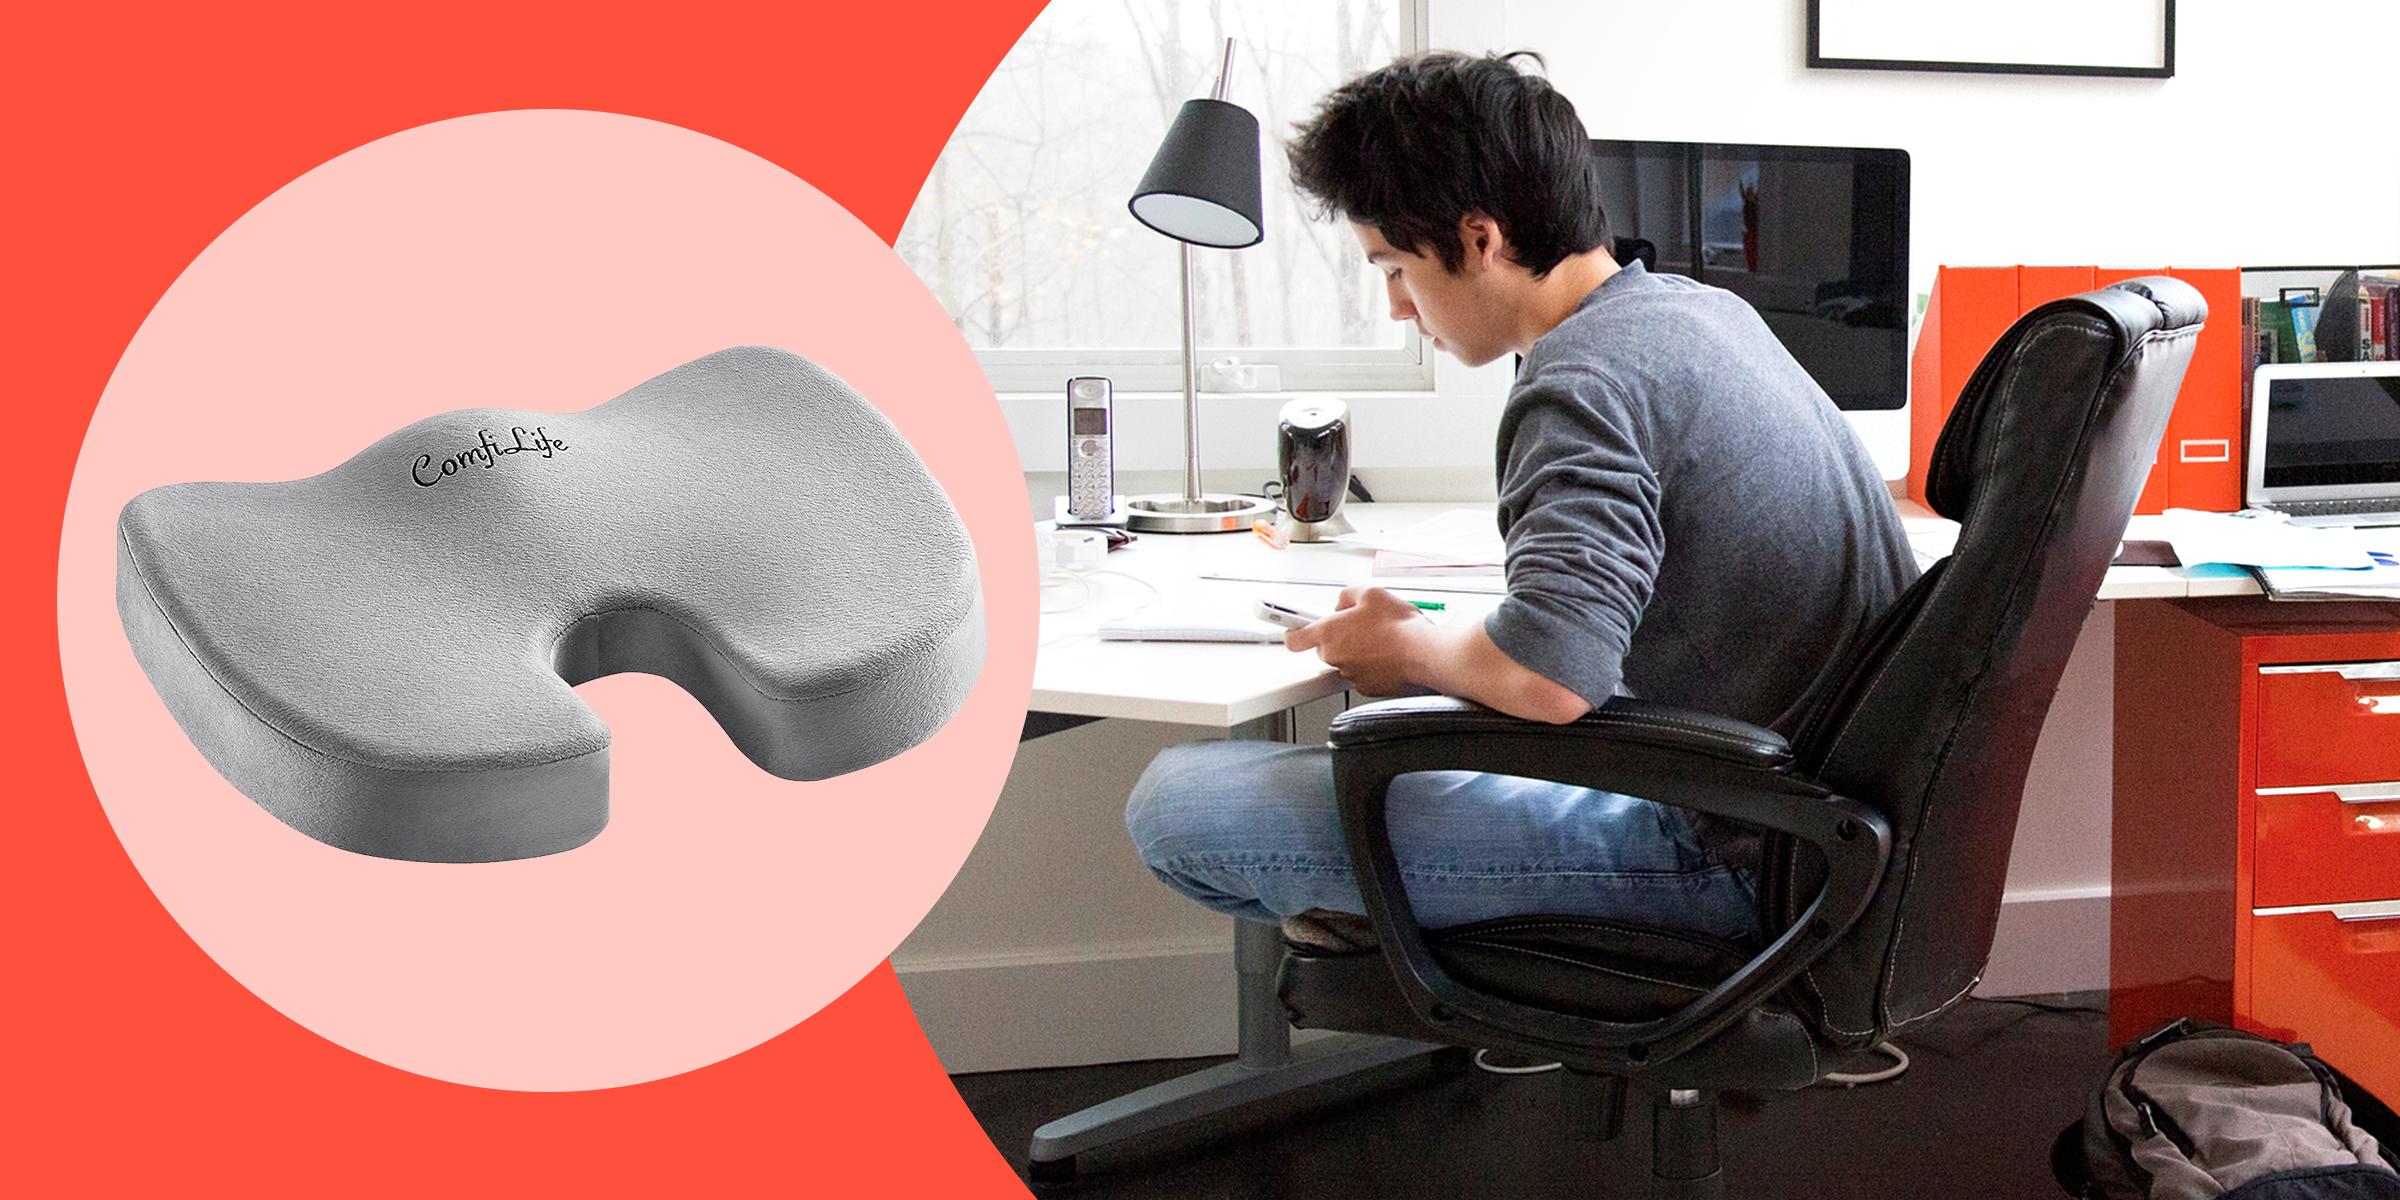 memory foam seat cushion for back pain